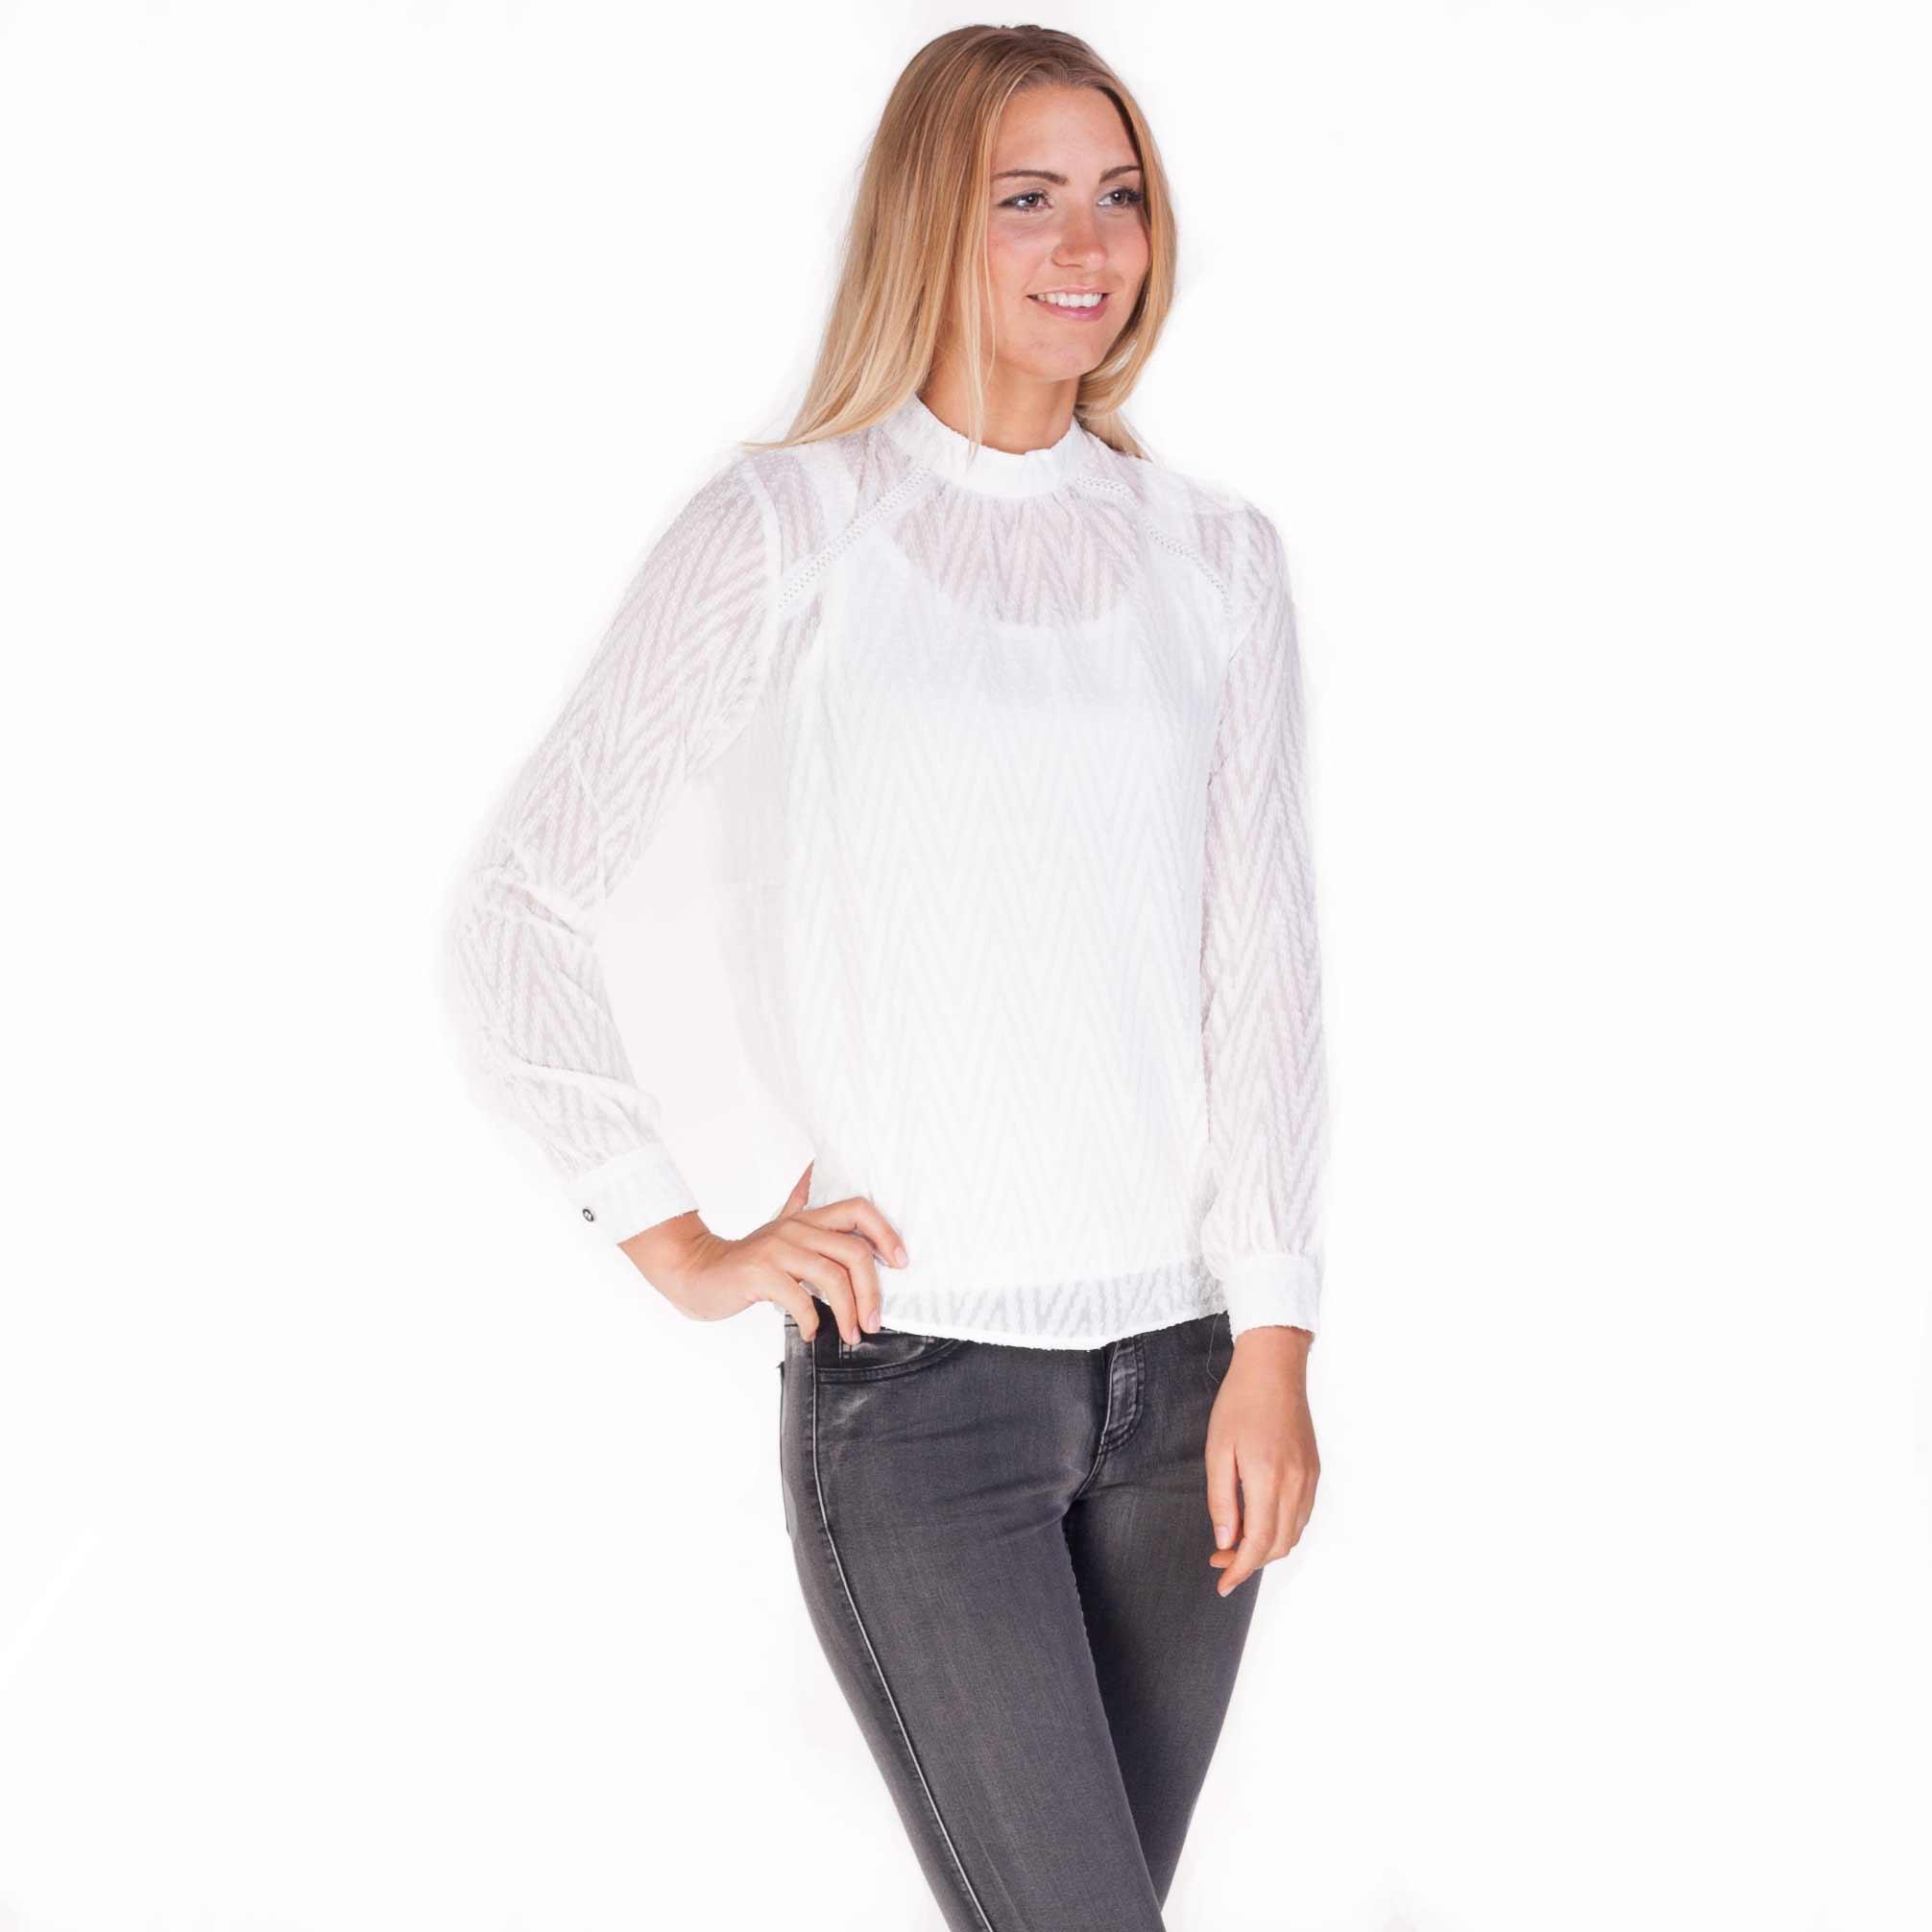 Lastest Buy ONLY Batwing Romantic Blouse For Women  Women39s White Blouses